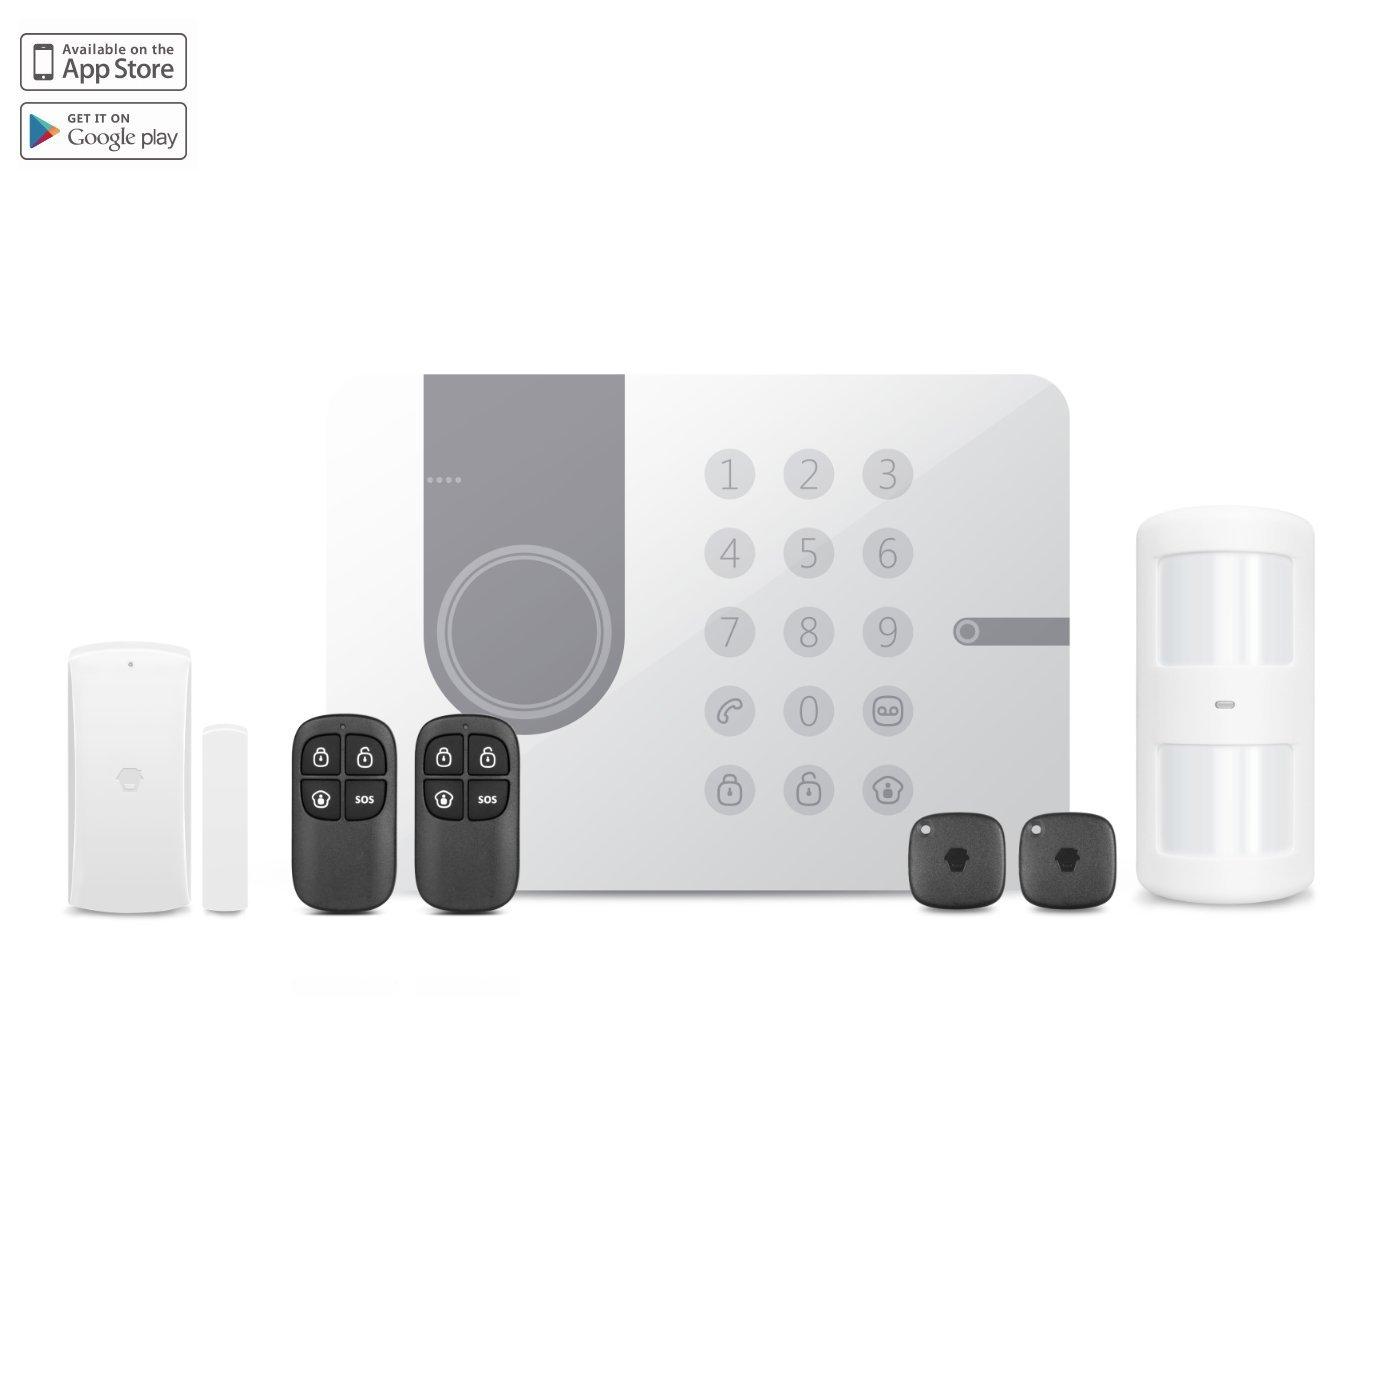 Chuango G5W 3G/WCDMA/RFID DIY Burglar Alarm System 3.7 V, Blanco: Amazon.es: Bricolaje y herramientas